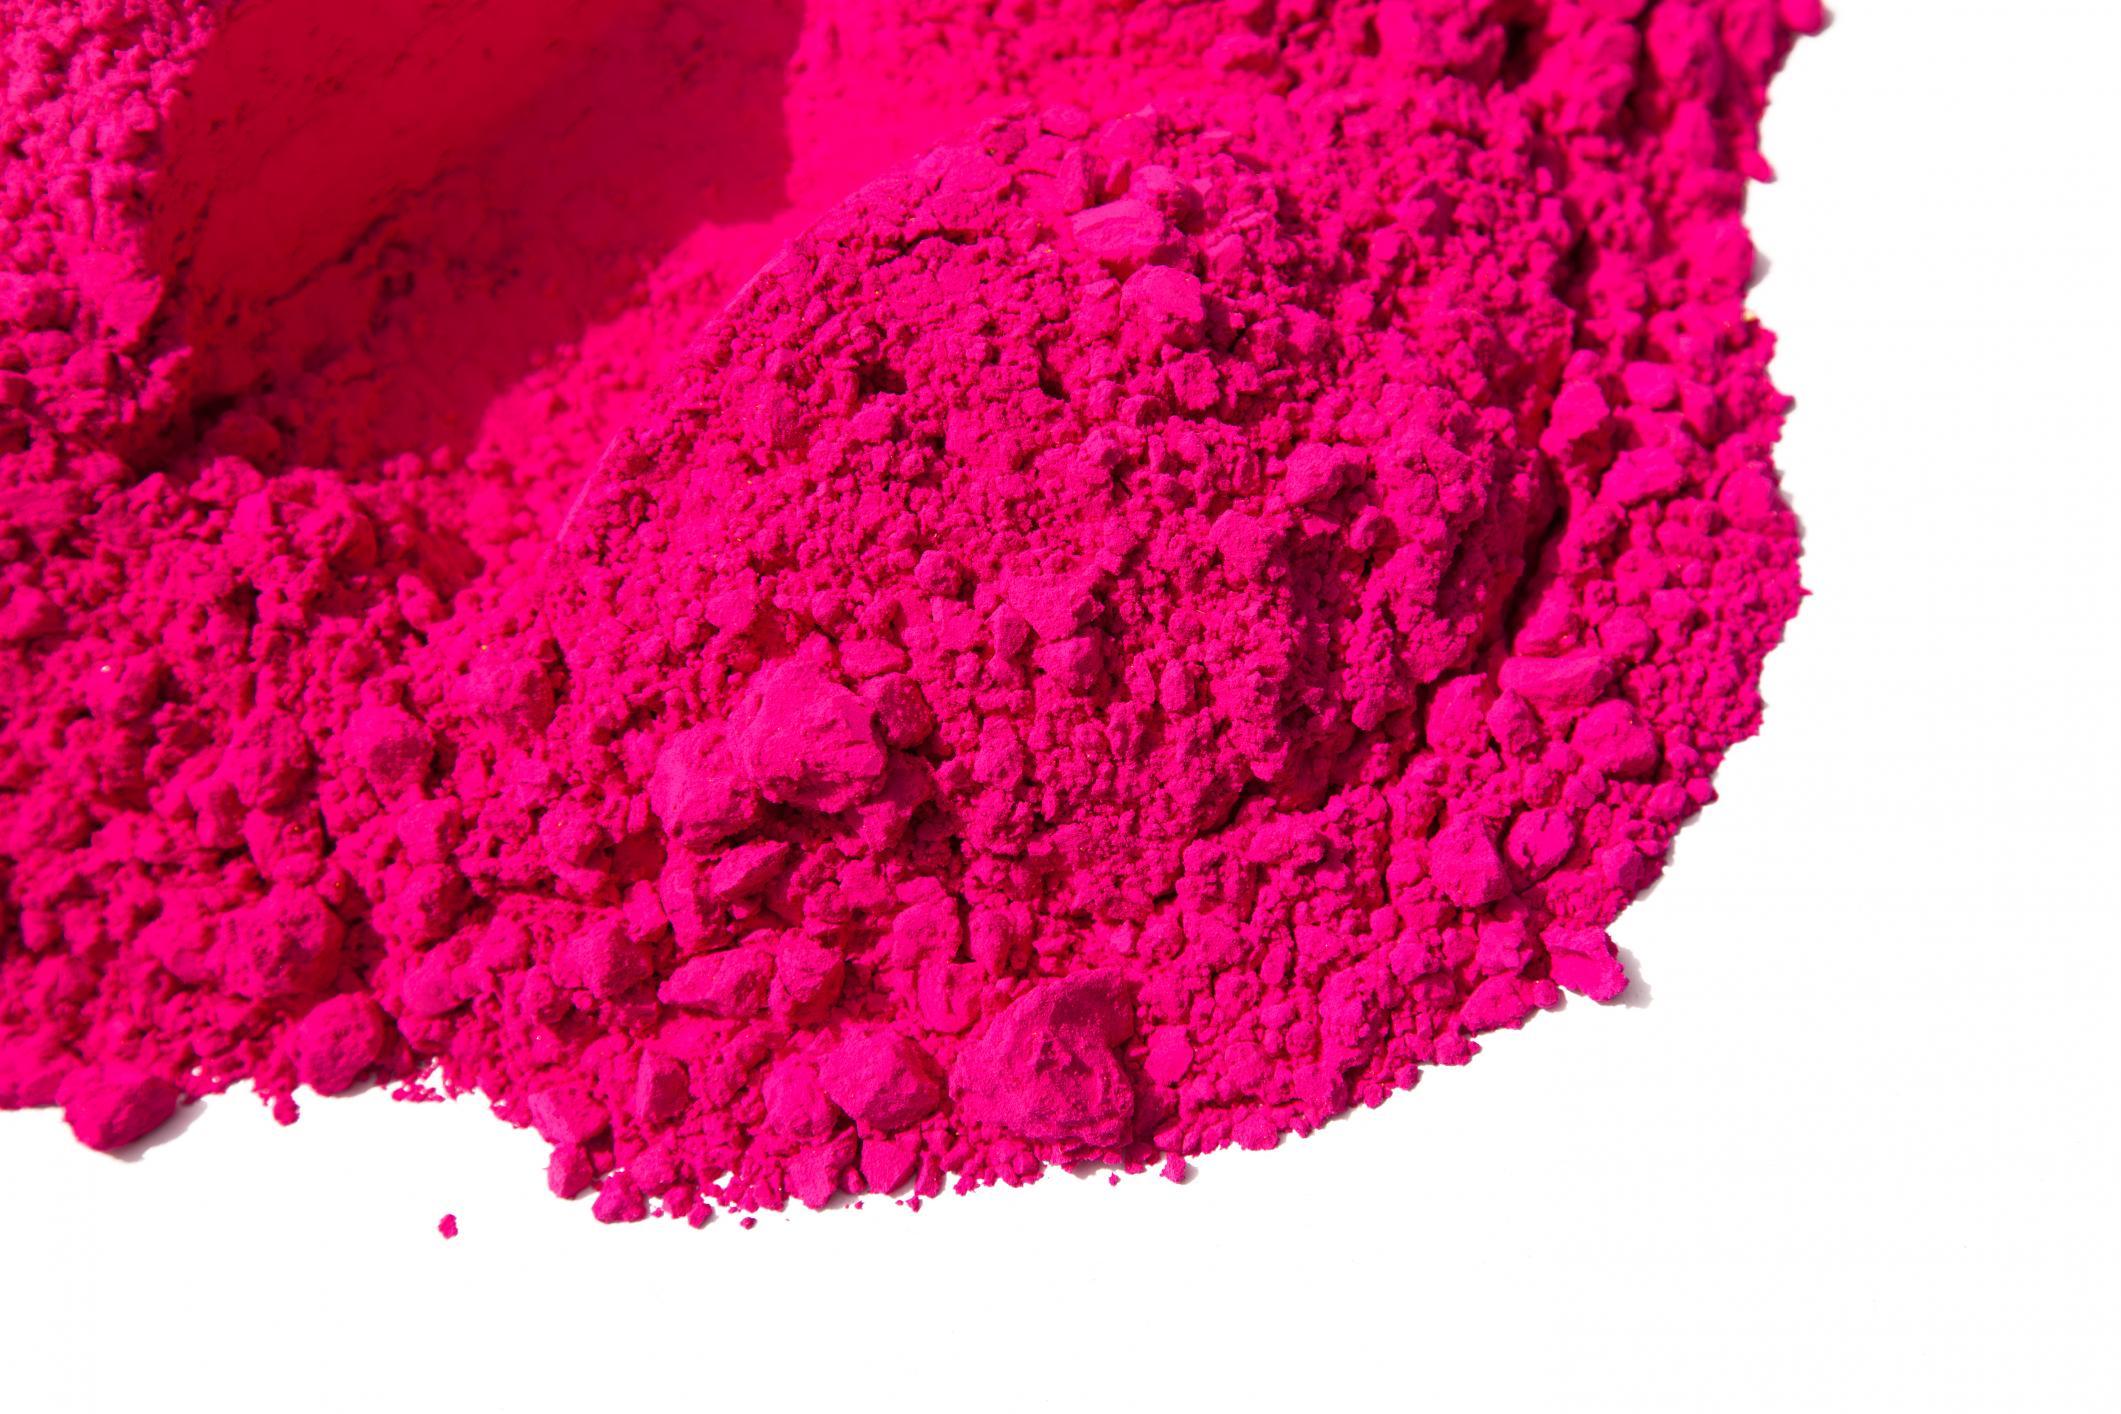 Color Powder Gender Reveal >> Using Color Powder At Gender Reveal Parties Color Powder Supply Co